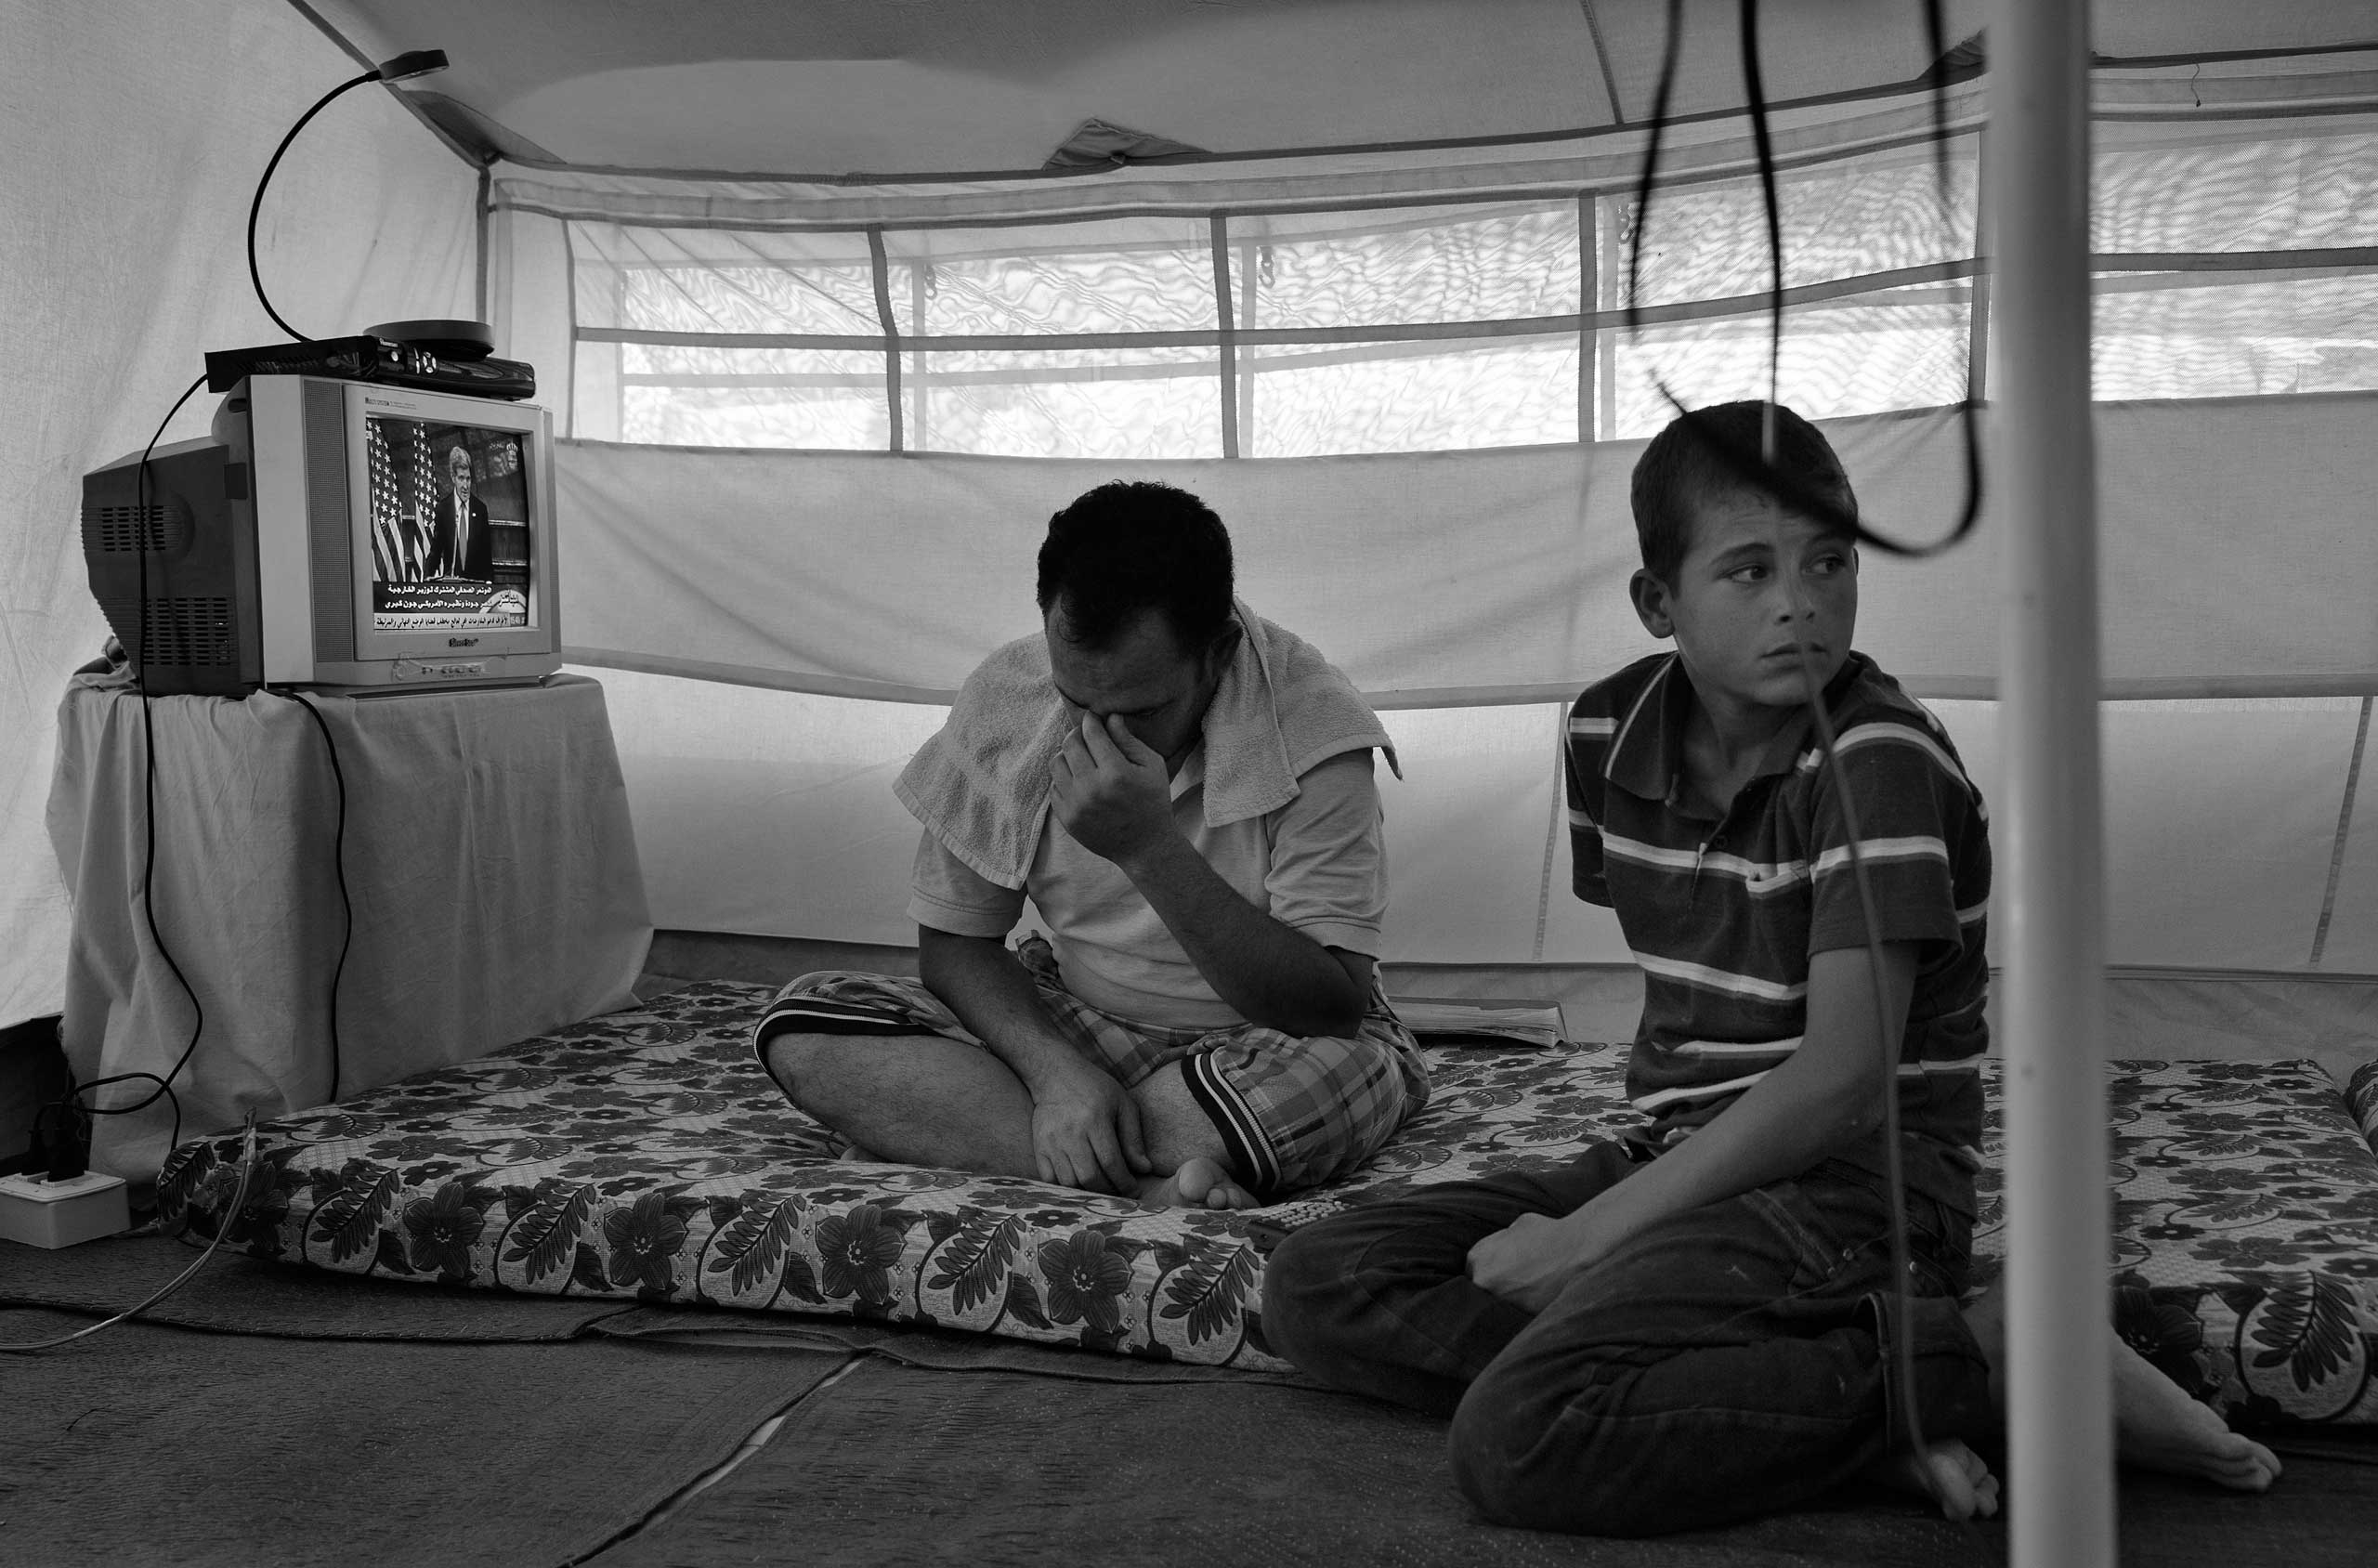 December 2013. Za'atari refugee camp, Jordan. A father and son in a camp tent.